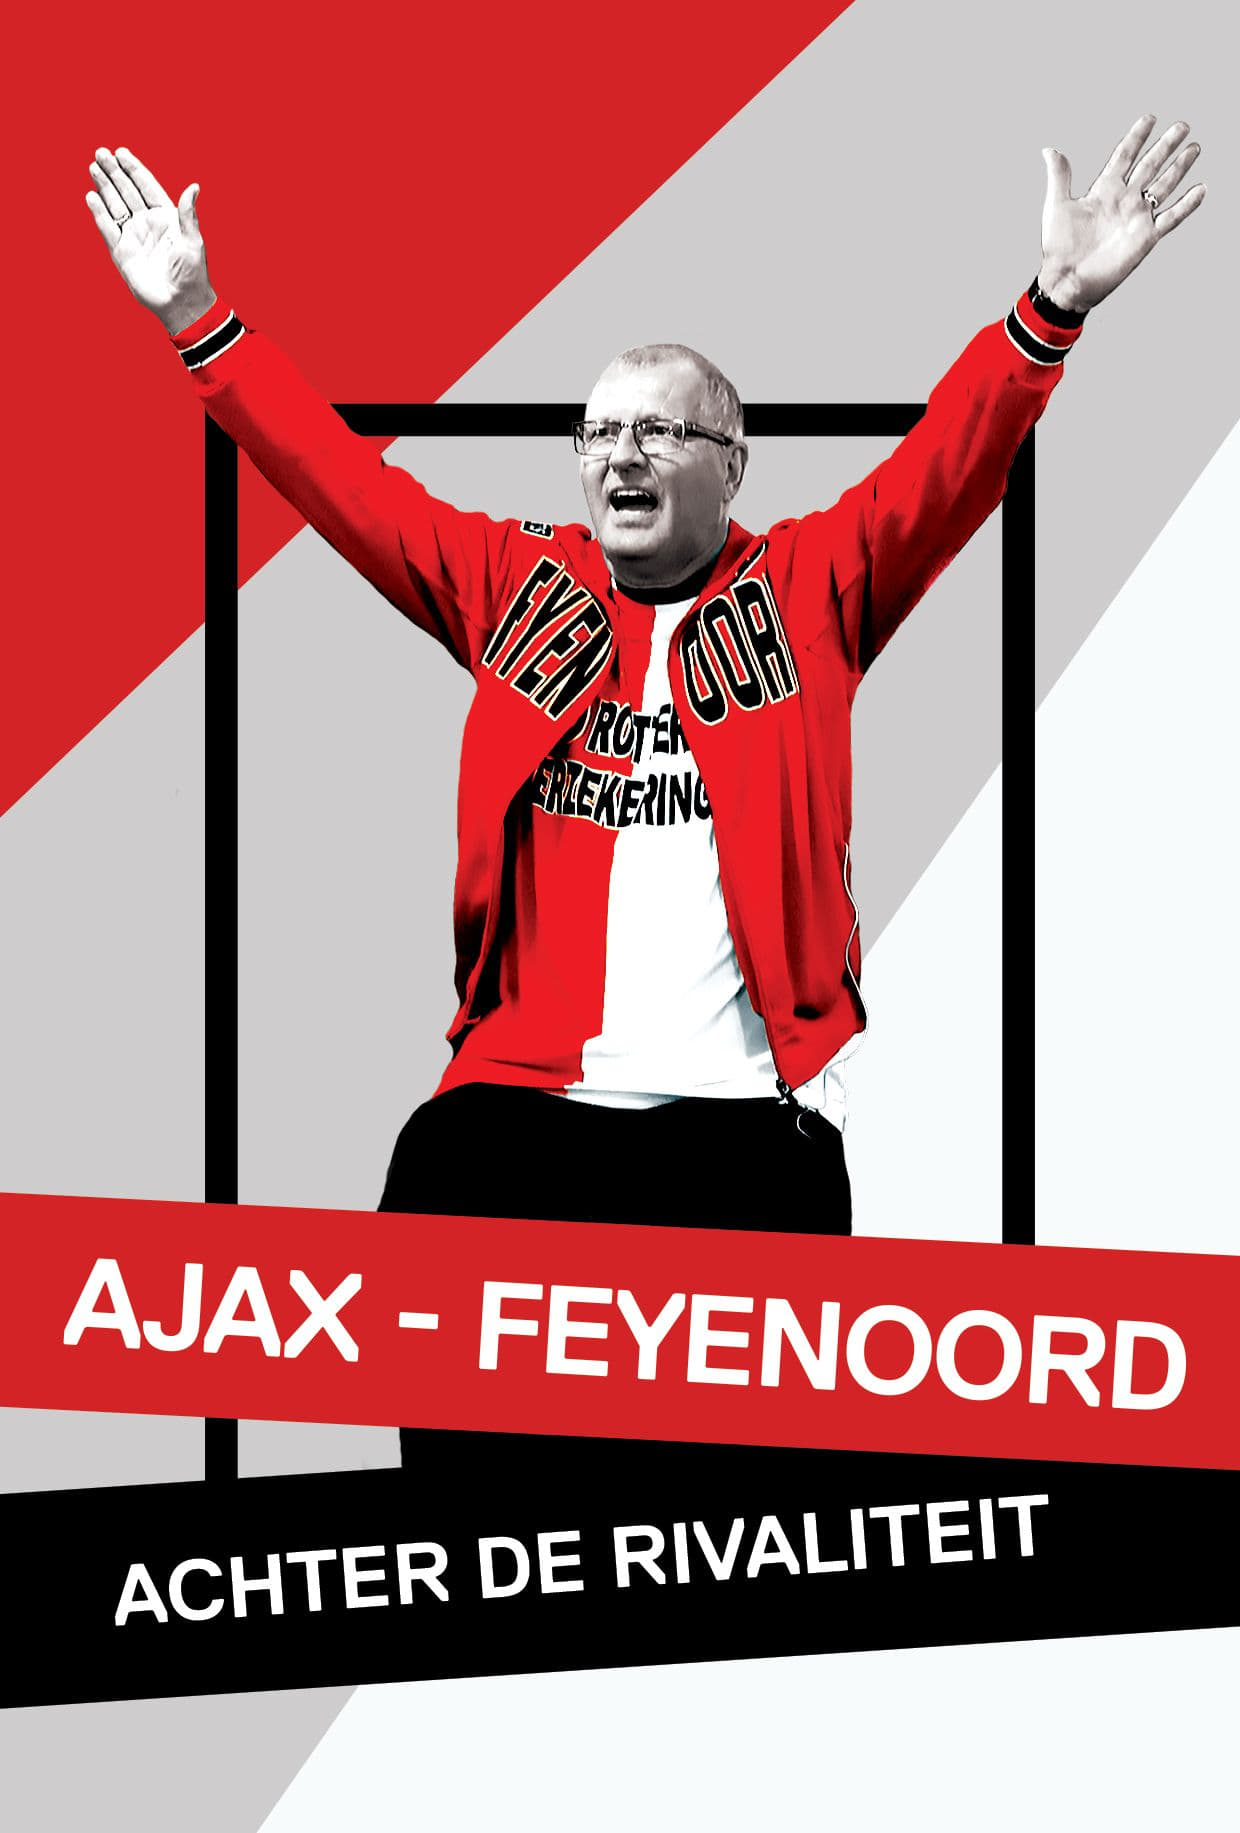 Ajax - Feyenoord: Achter de Rivaliteit (2017)